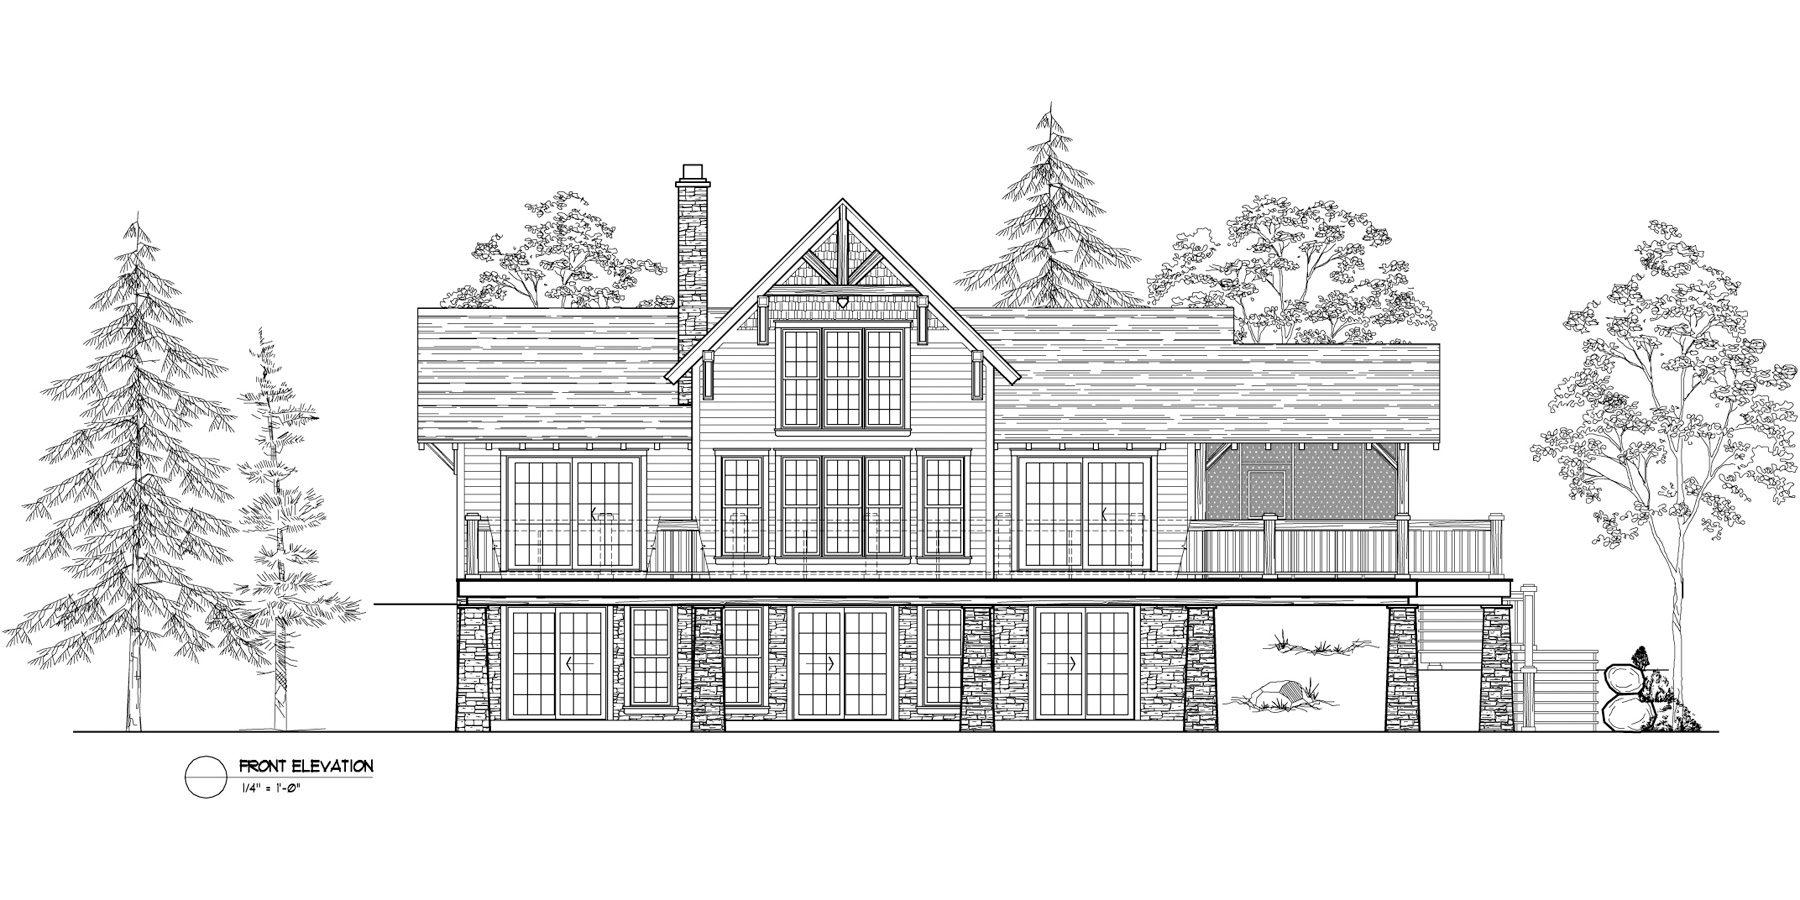 Normerica Timber Frames, House Plan, The Lanark 3522, Front Elevation